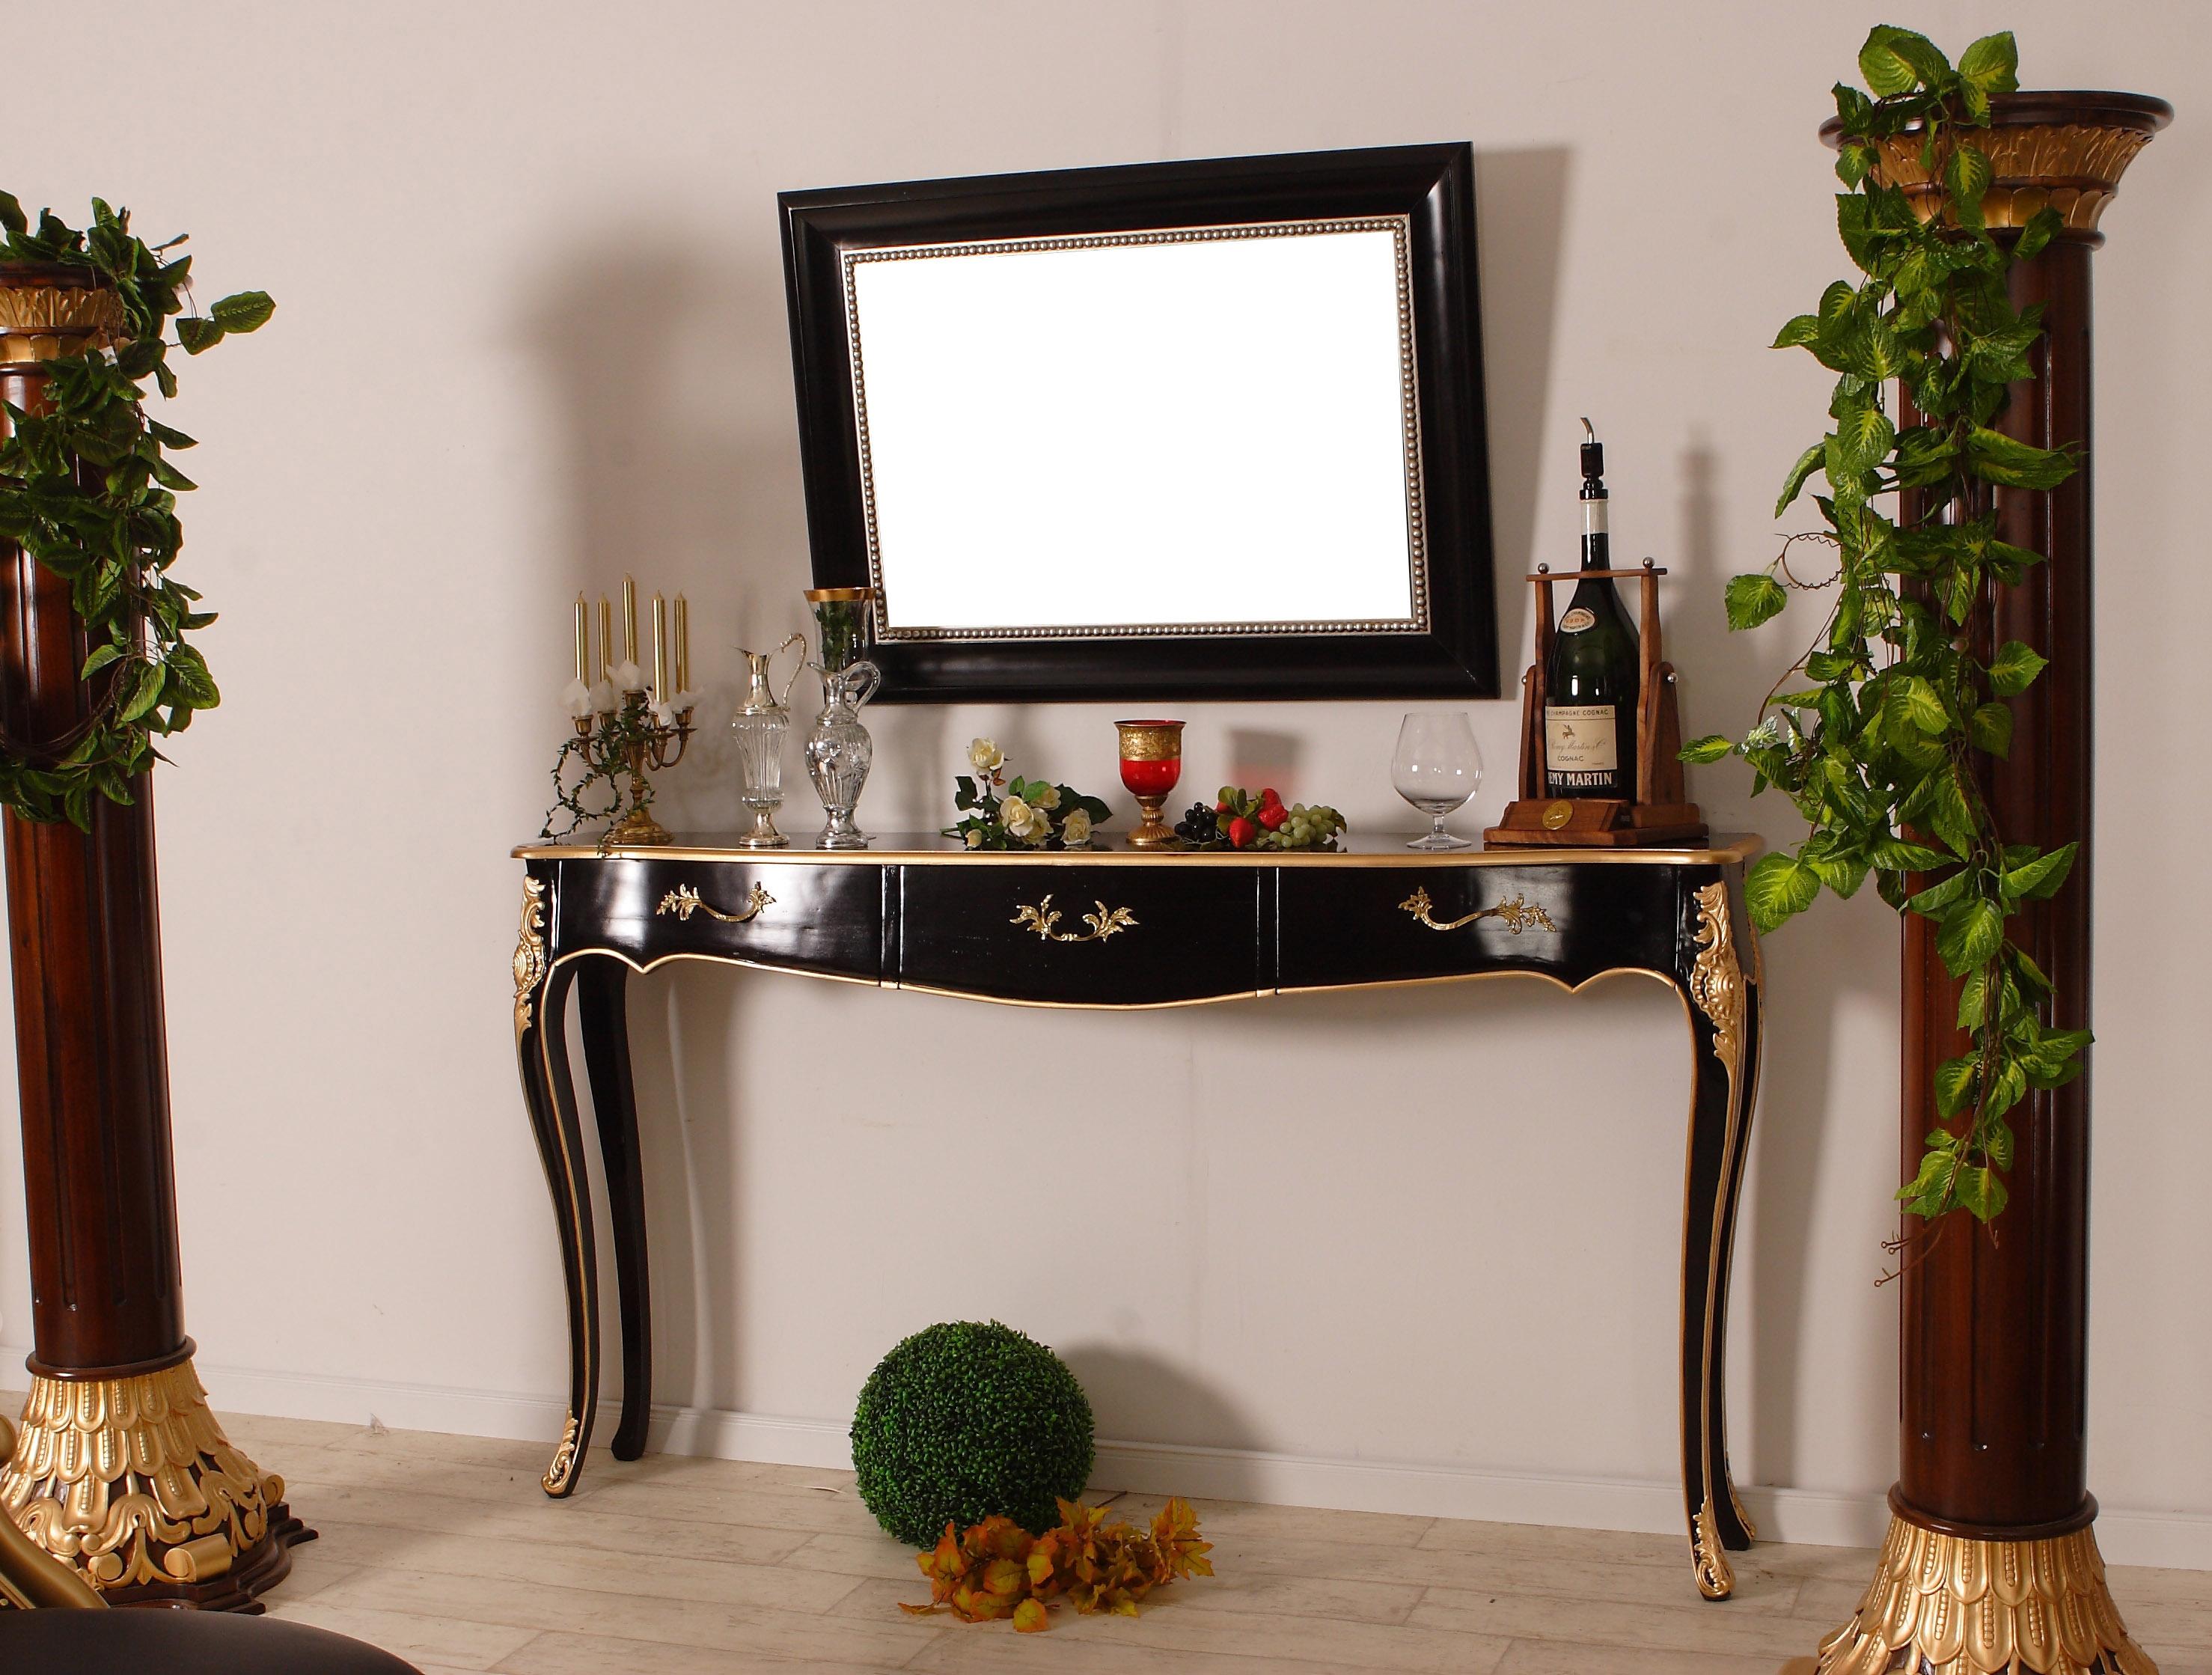 anrichten lionsstar gmbh. Black Bedroom Furniture Sets. Home Design Ideas